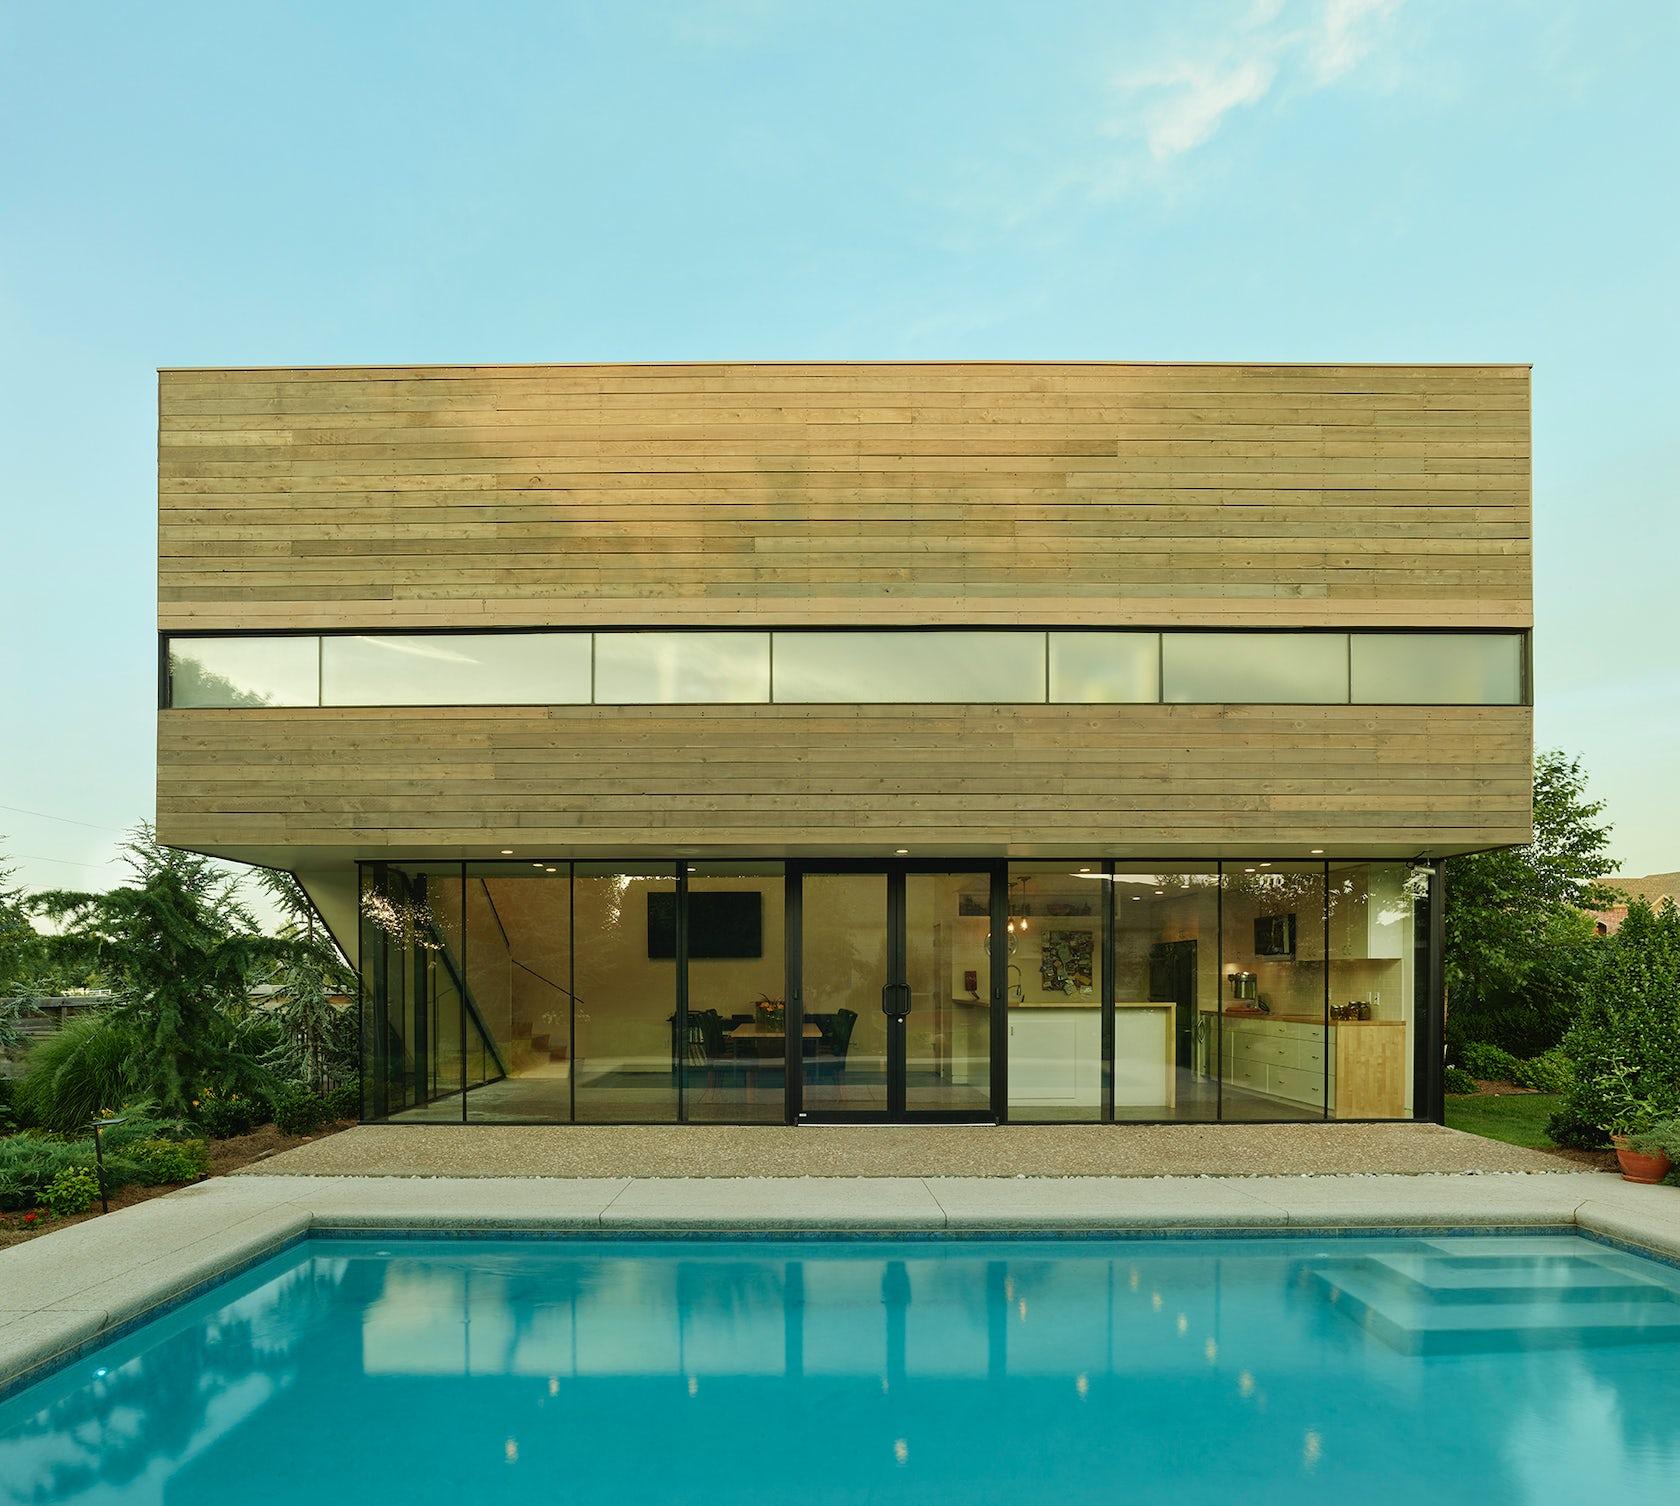 Srygley poolhouse architizer for Pool design maryland